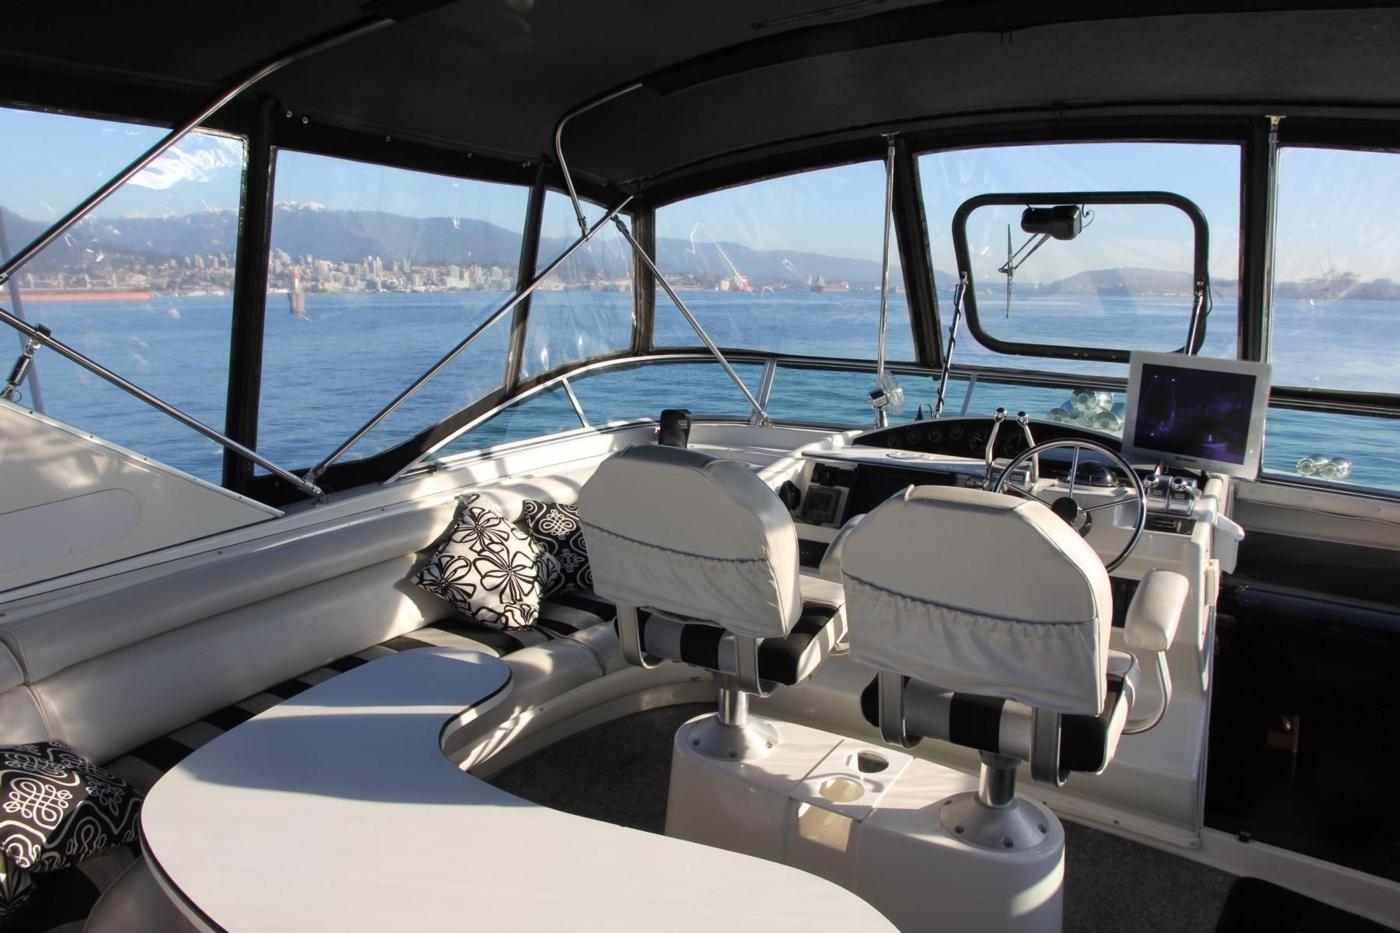 1999 Bayliner 5788 Pilot House Motoryacht, Settee Table